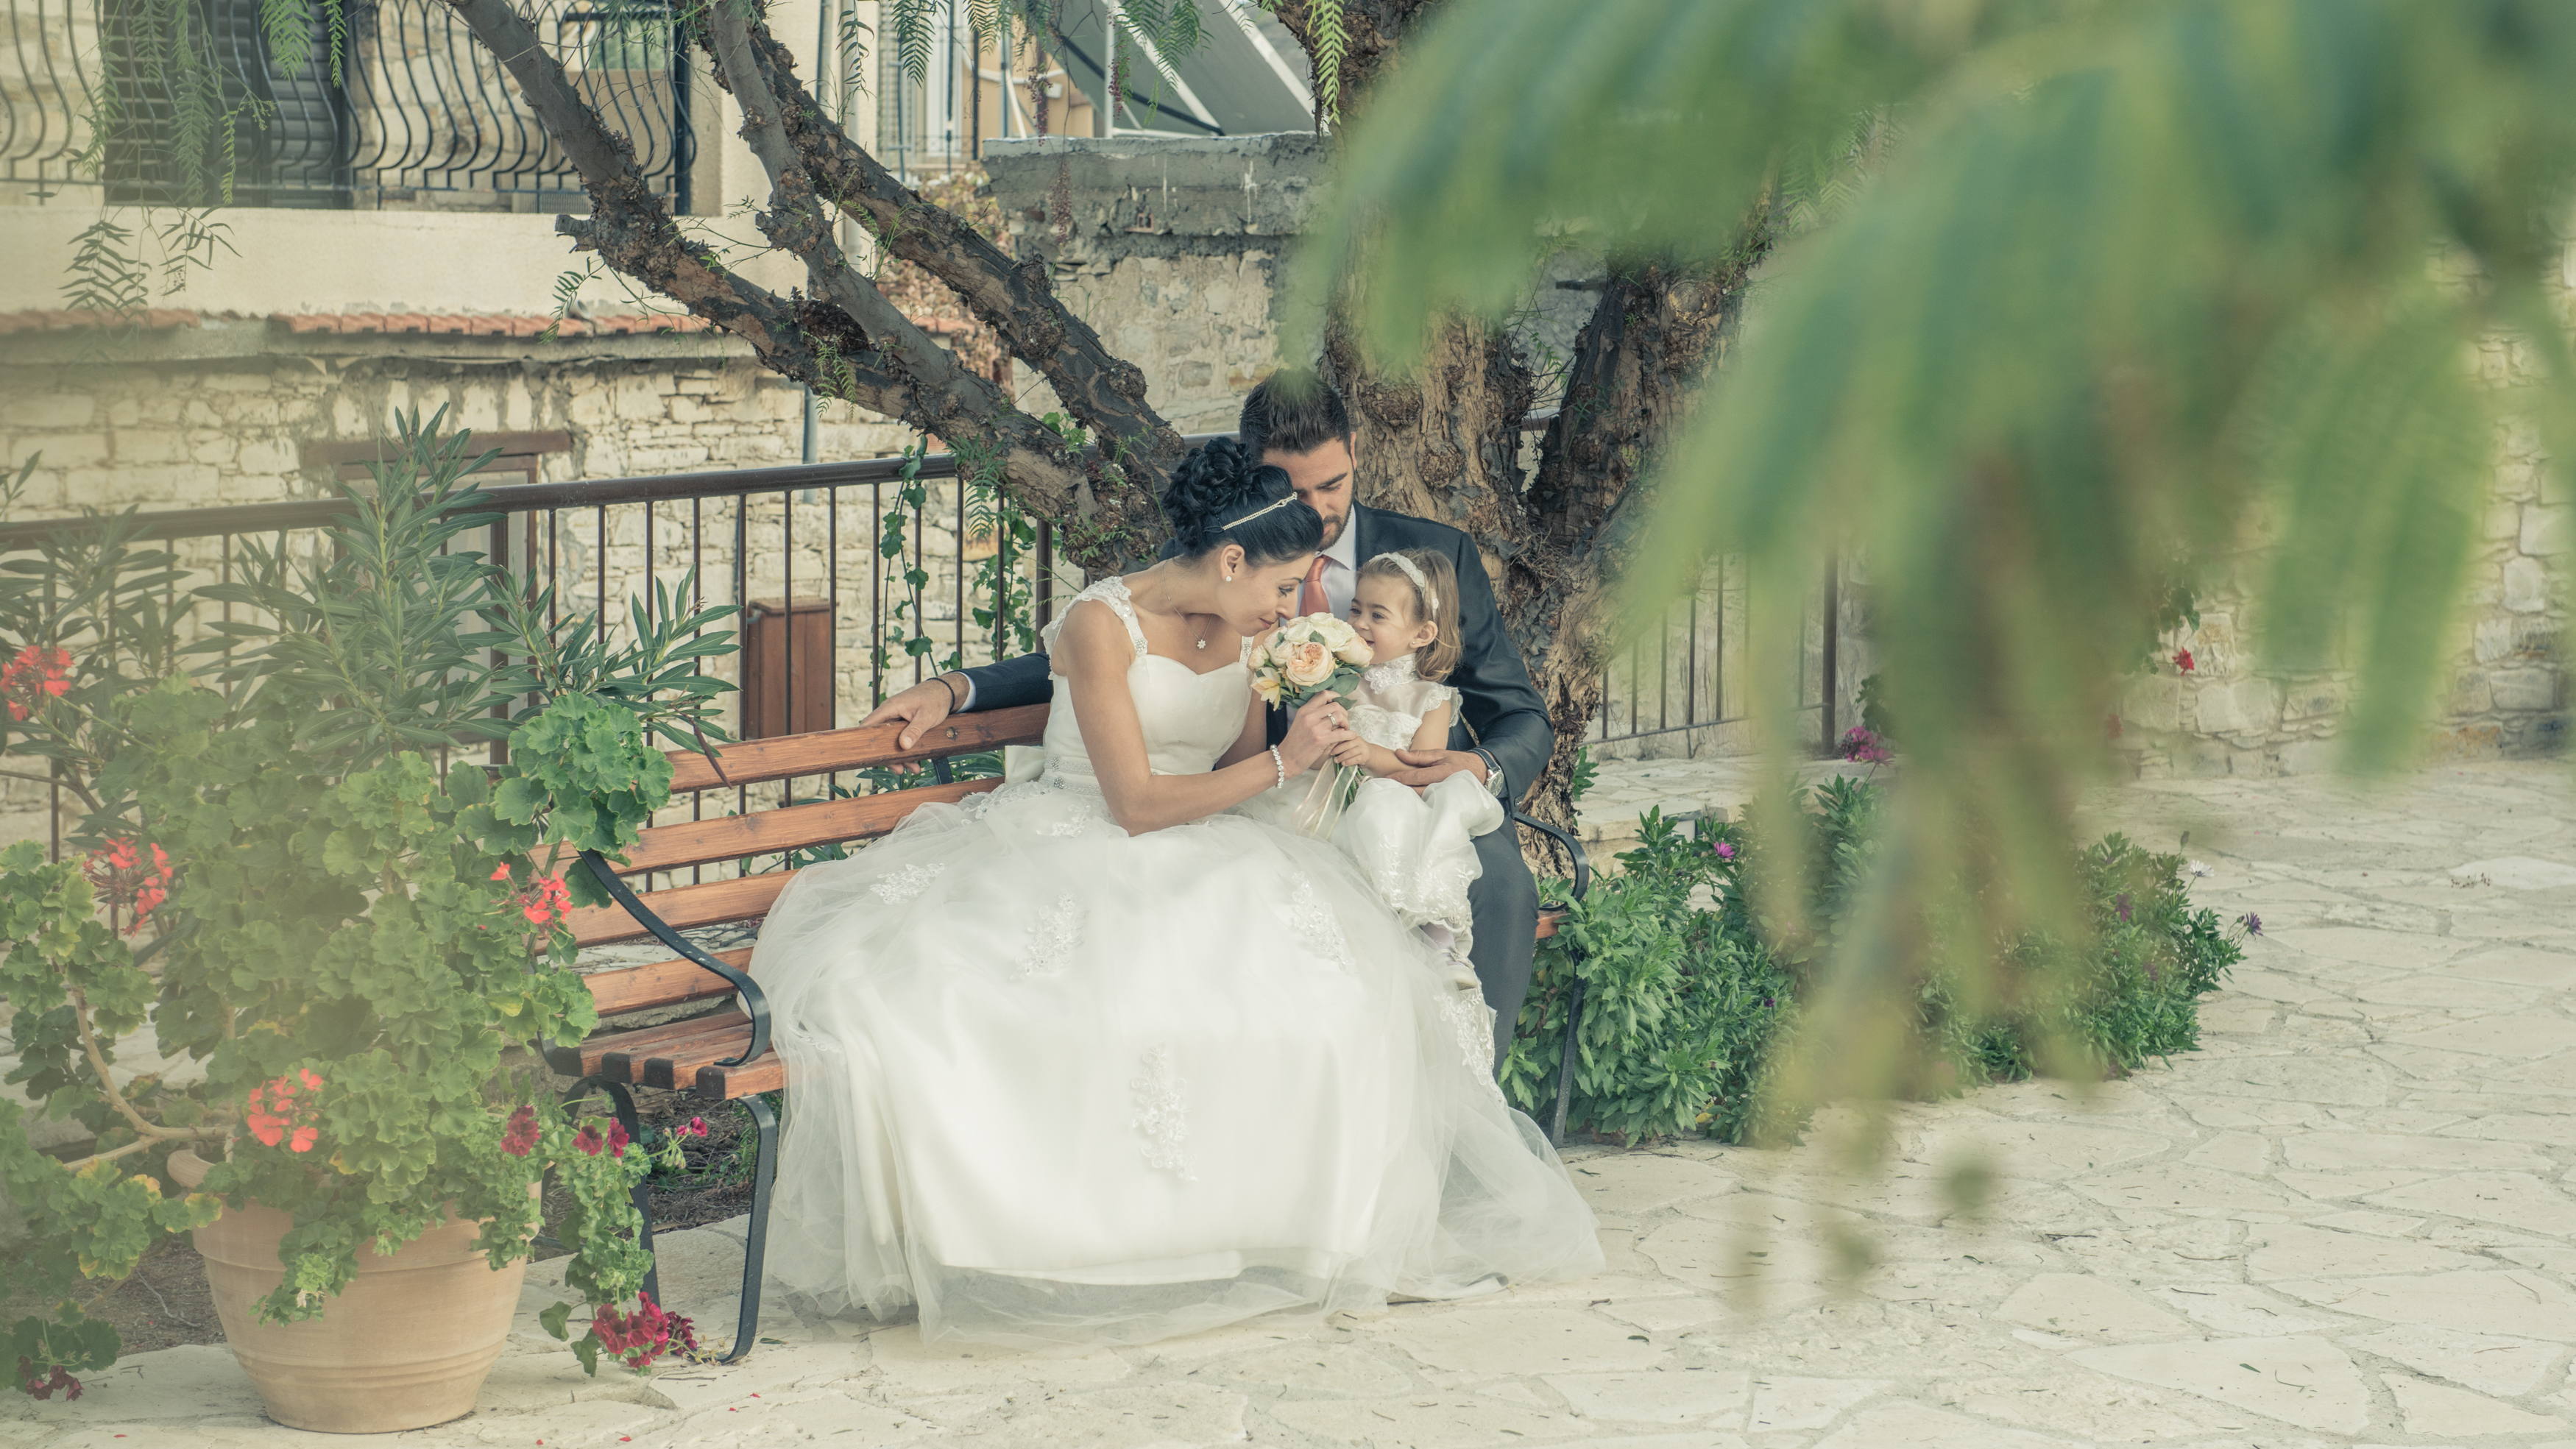 Wedding | Paraskevas – Mikaella | iCreate Photography